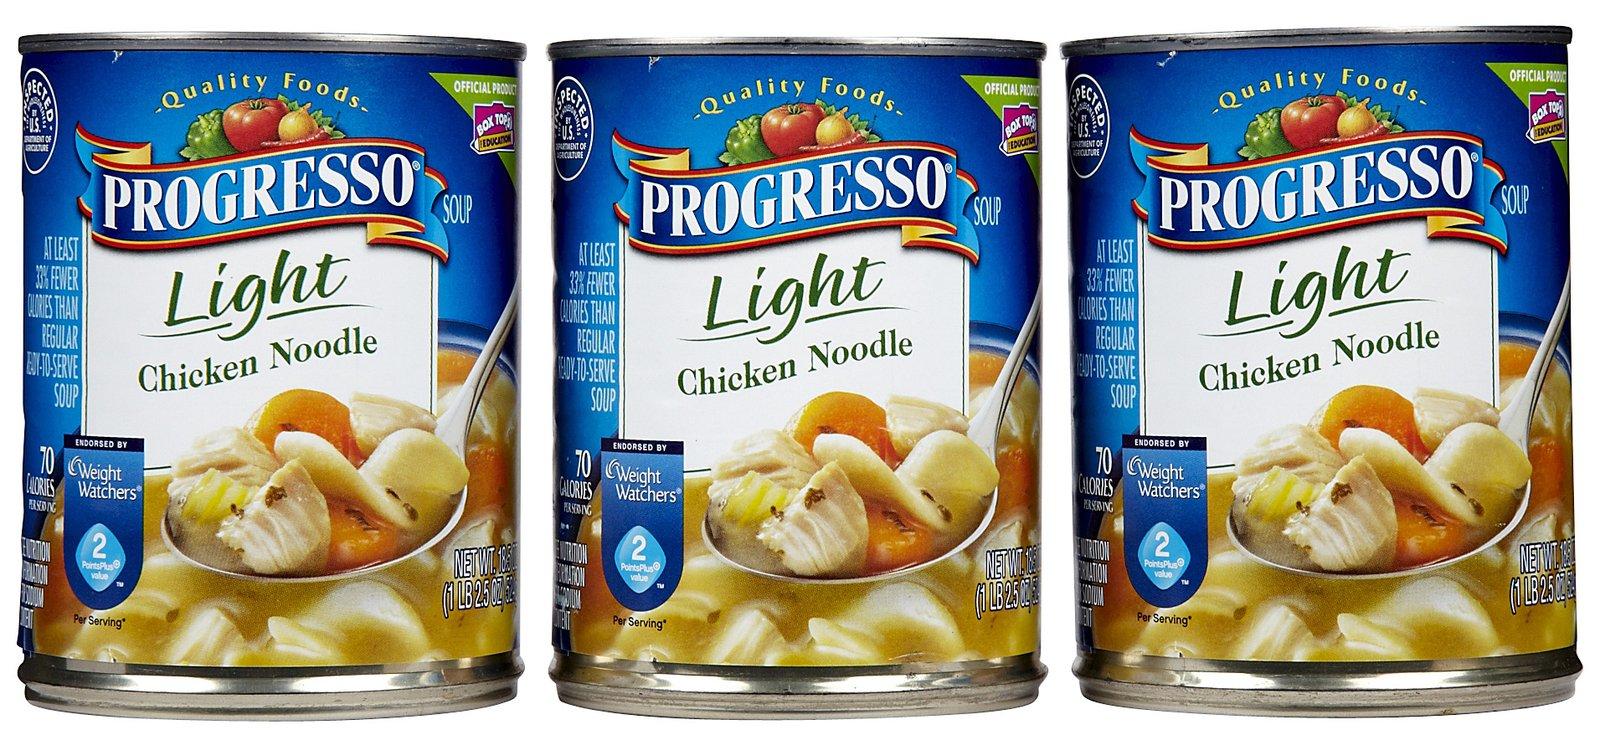 Elegant Progresso Light Soup Photo